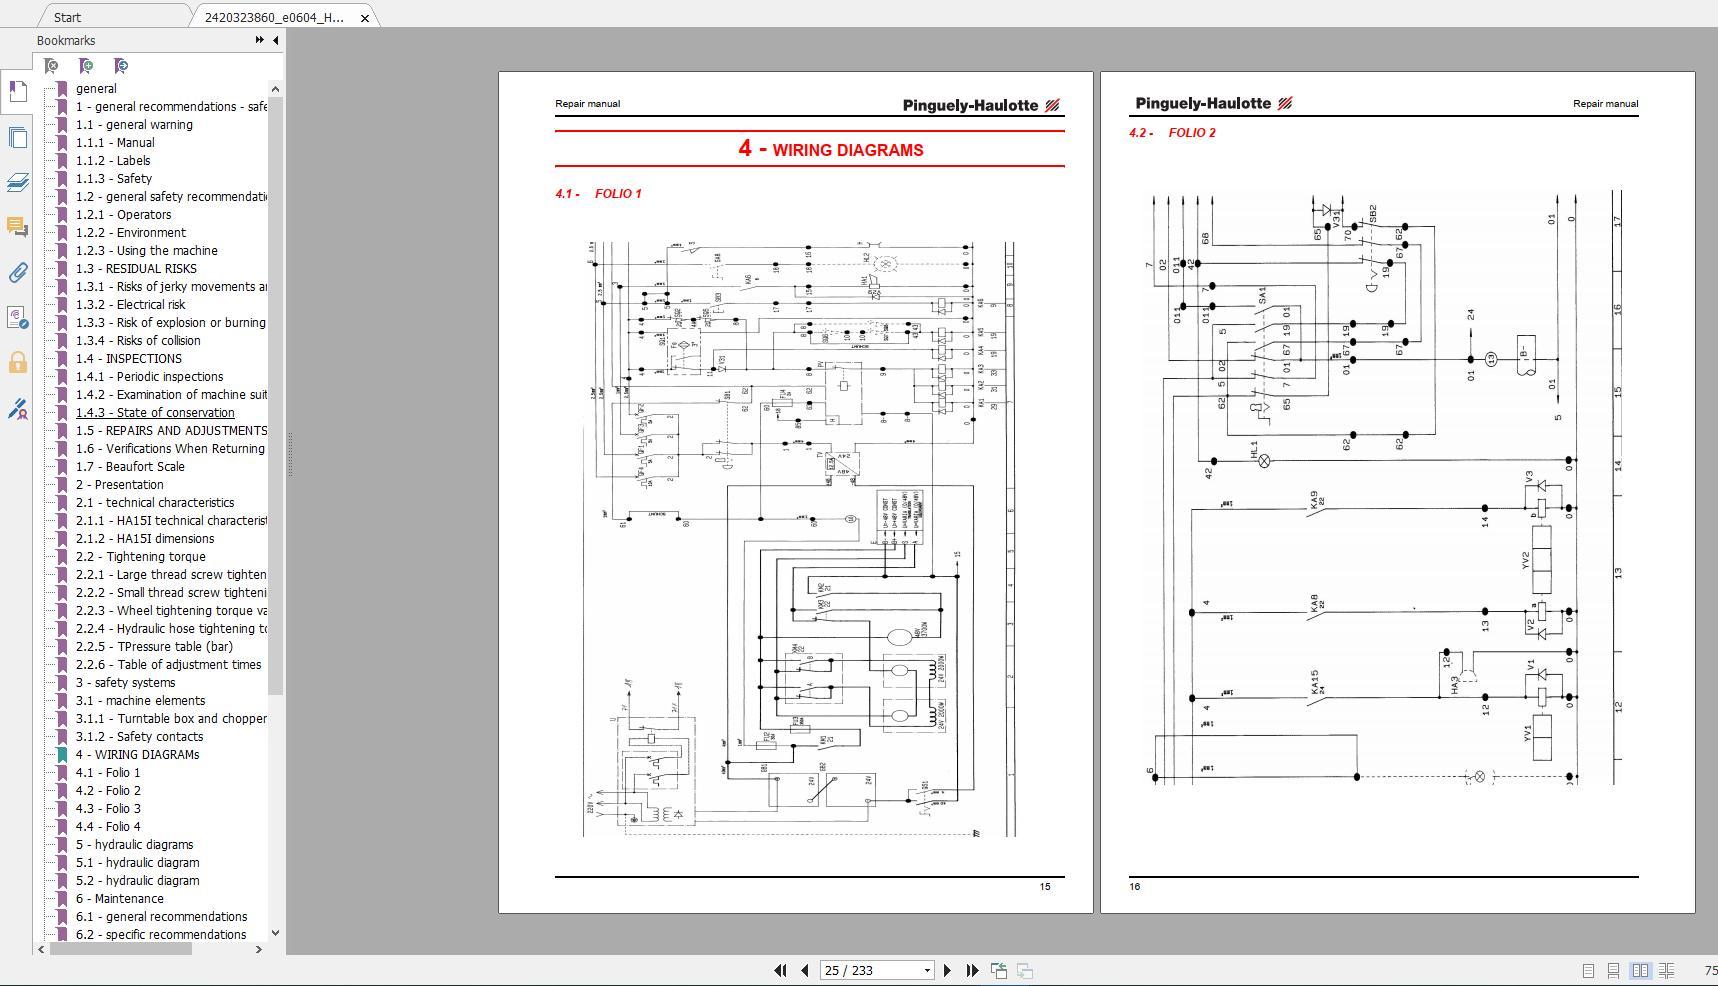 Haulotte_Work_Platforms_and_Telehandlers_Service_Maintenance_Operators_Manual_Training_Spare_Parts_Manual_DVD18